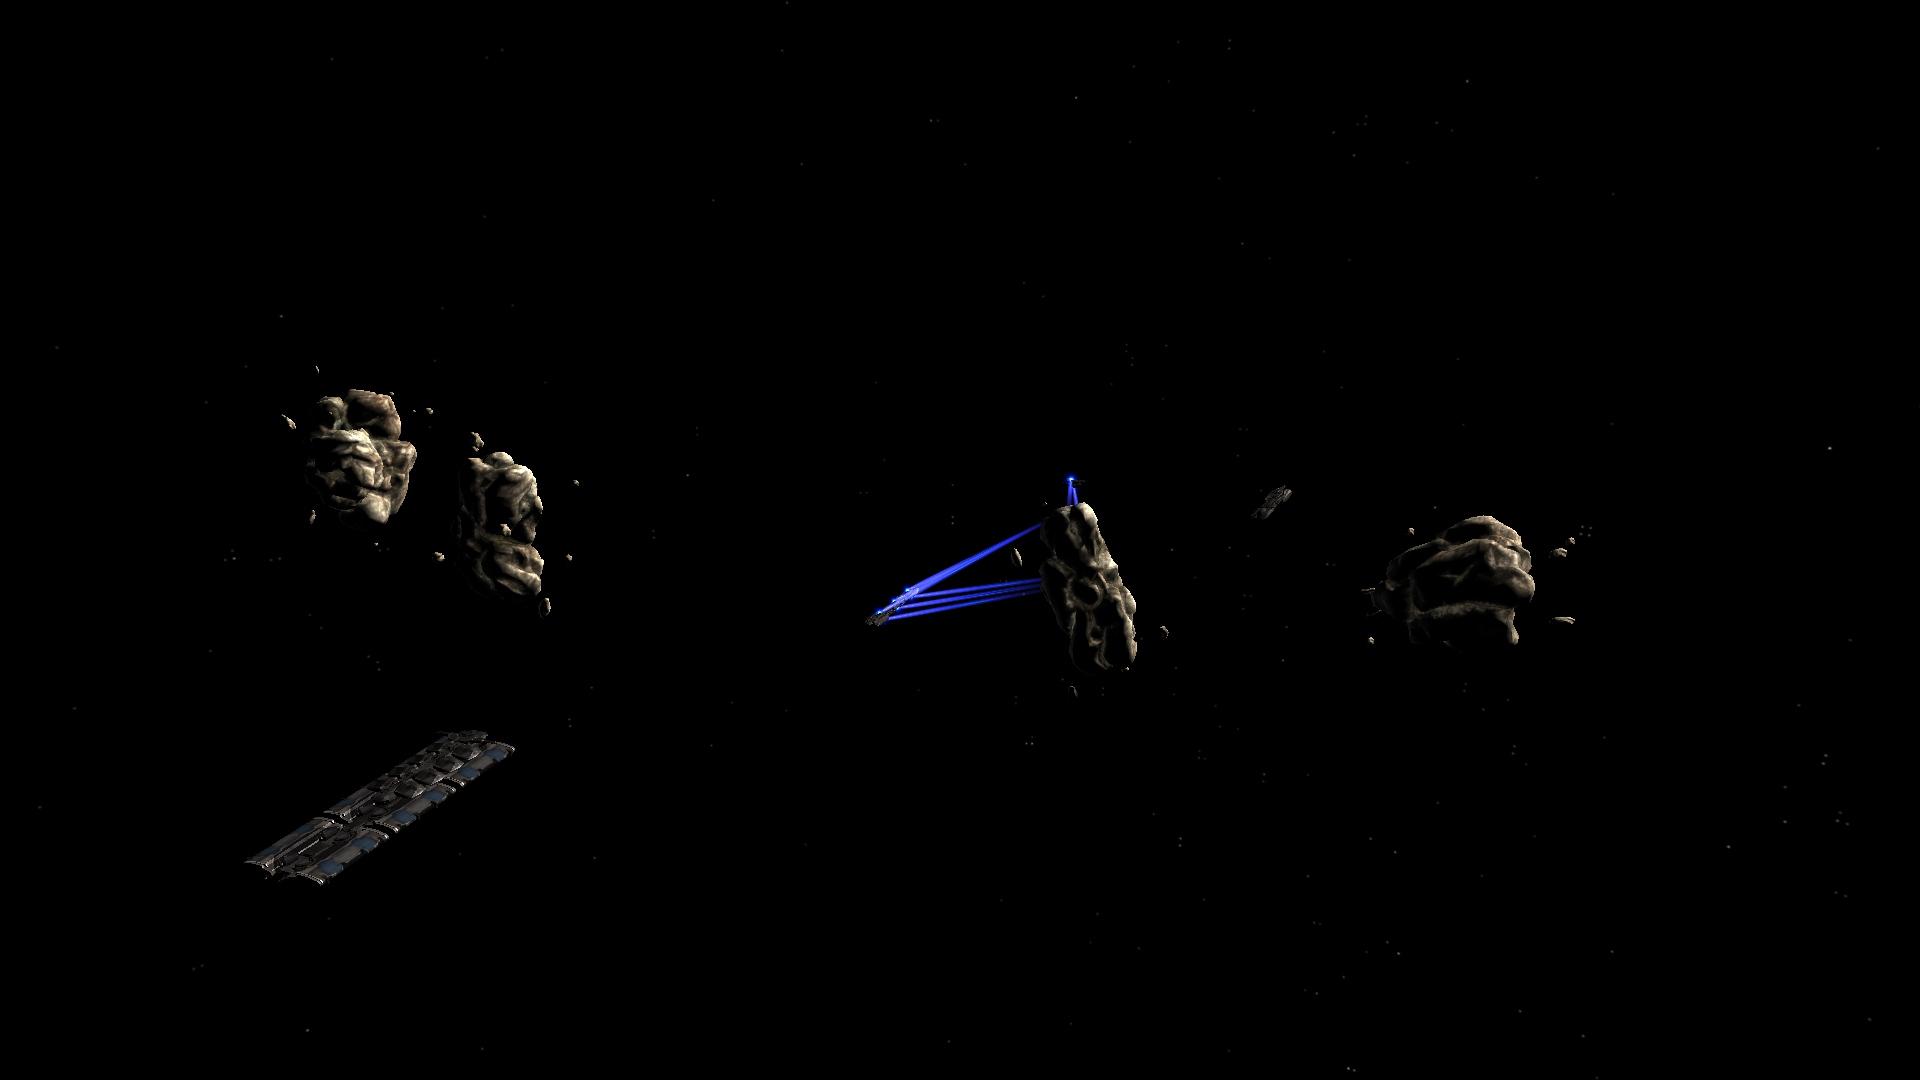 ice comet asteroids - photo #41